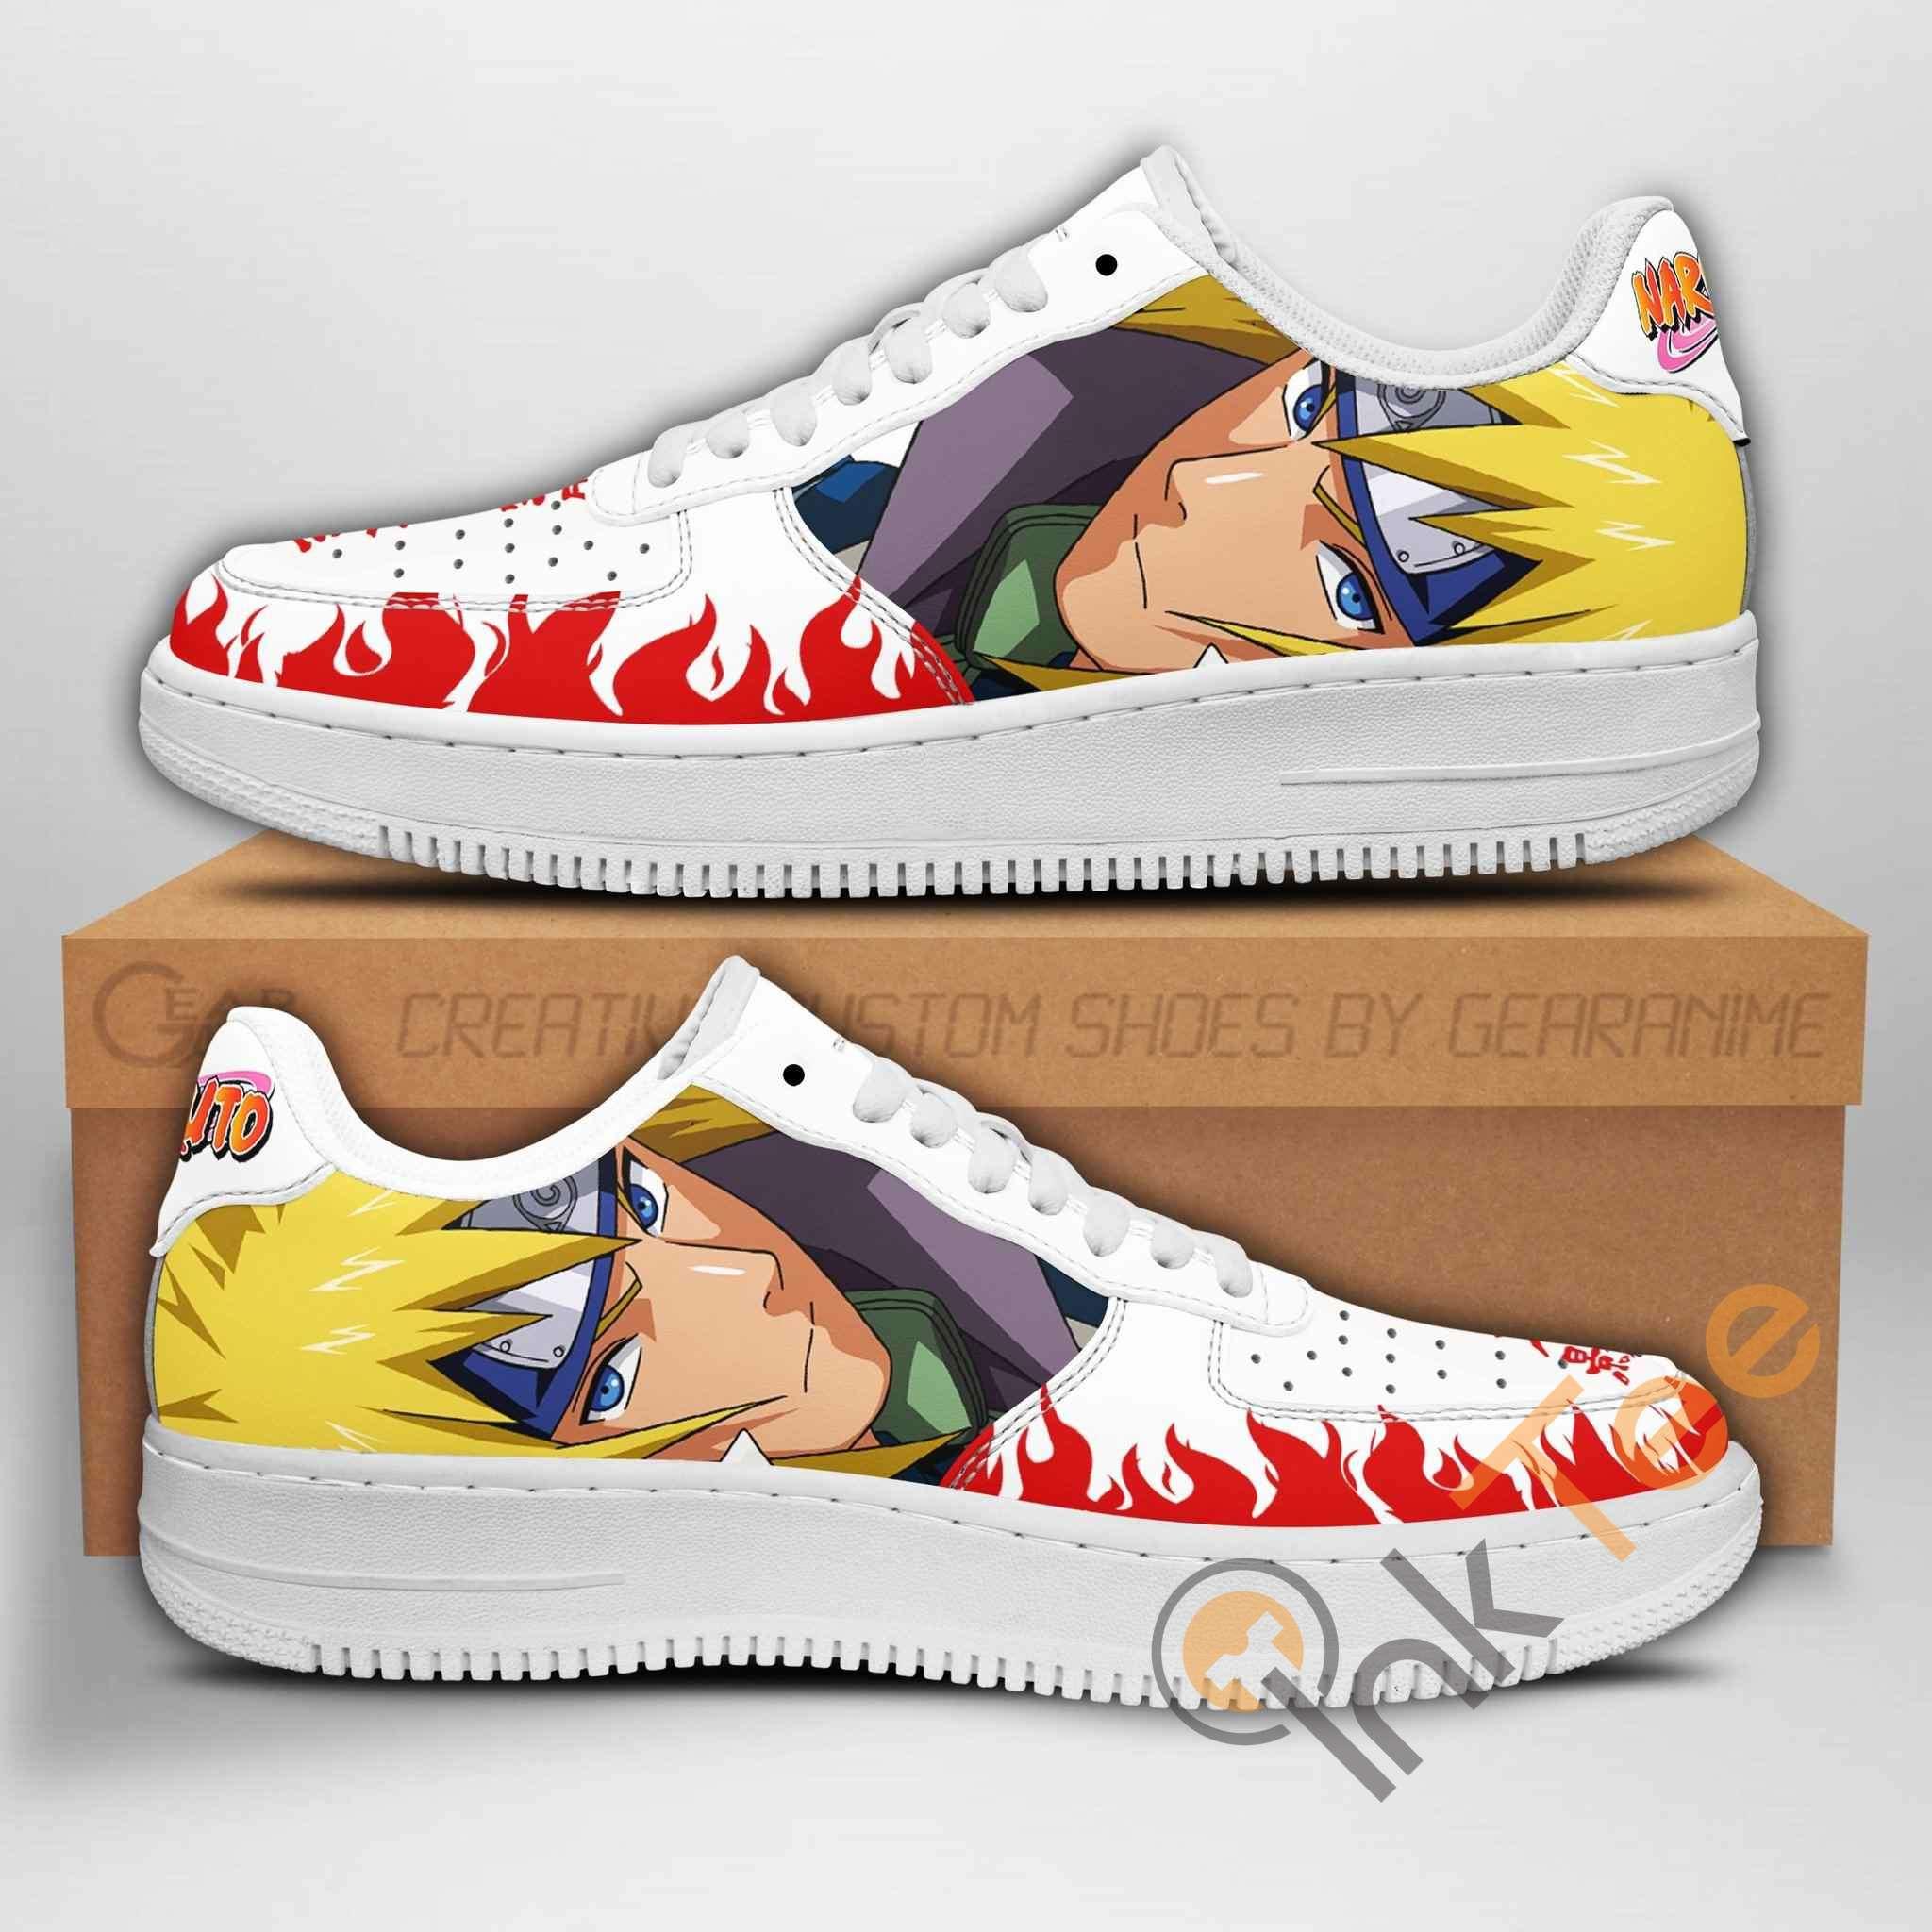 Minato Naruto Anime Nike Air Force Shoes